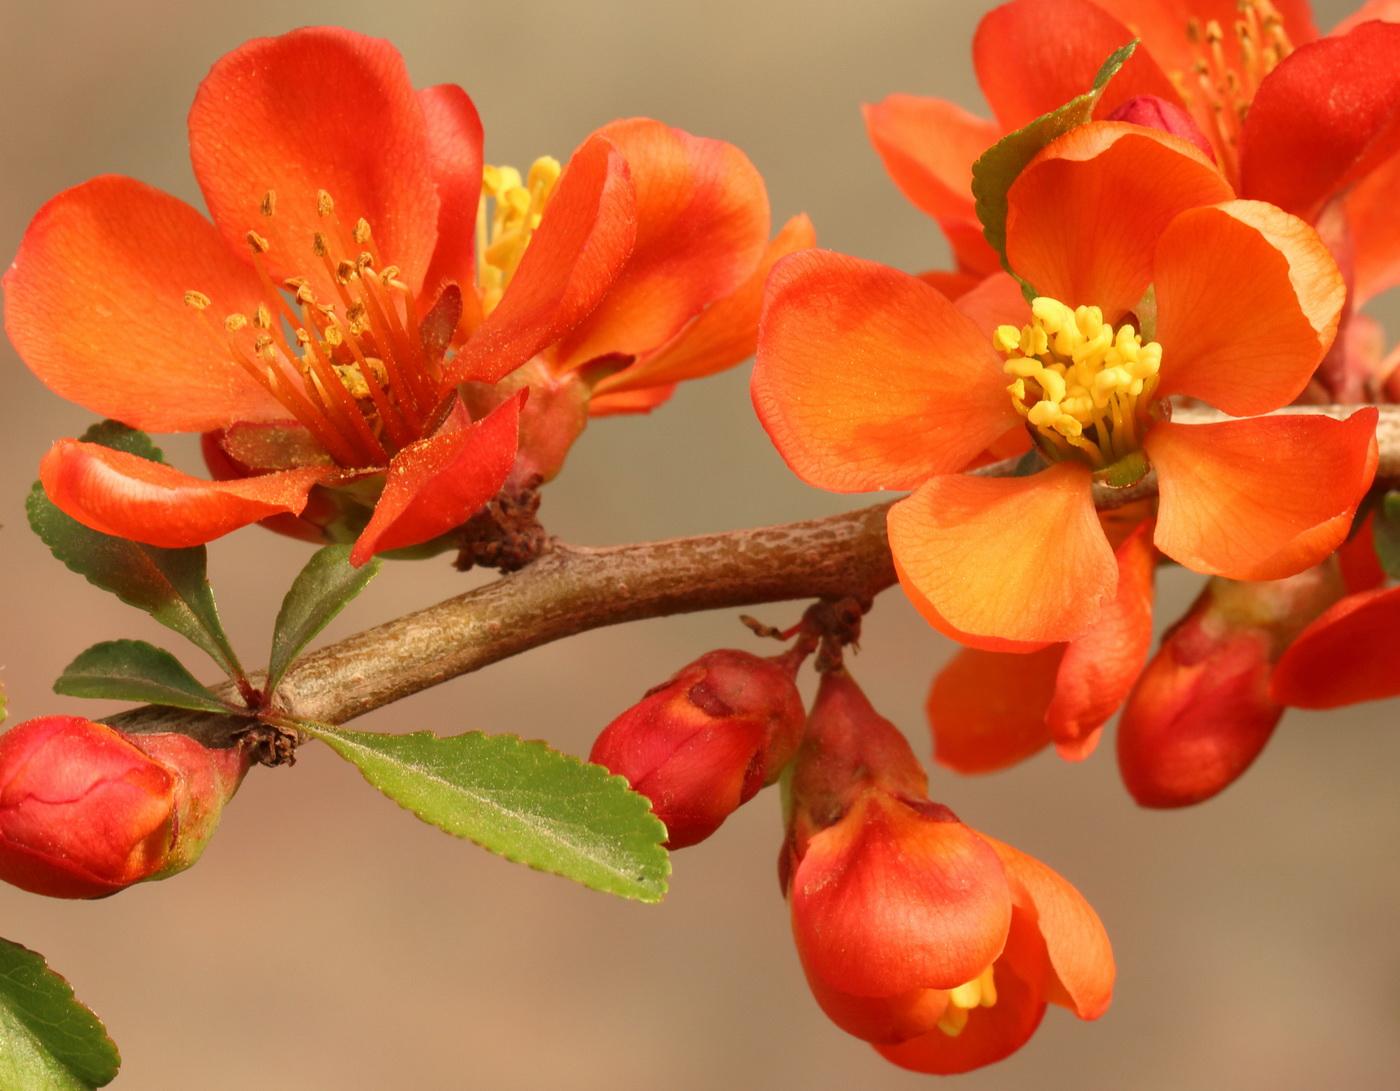 Айвочка японская (Chaenomeles japonica)